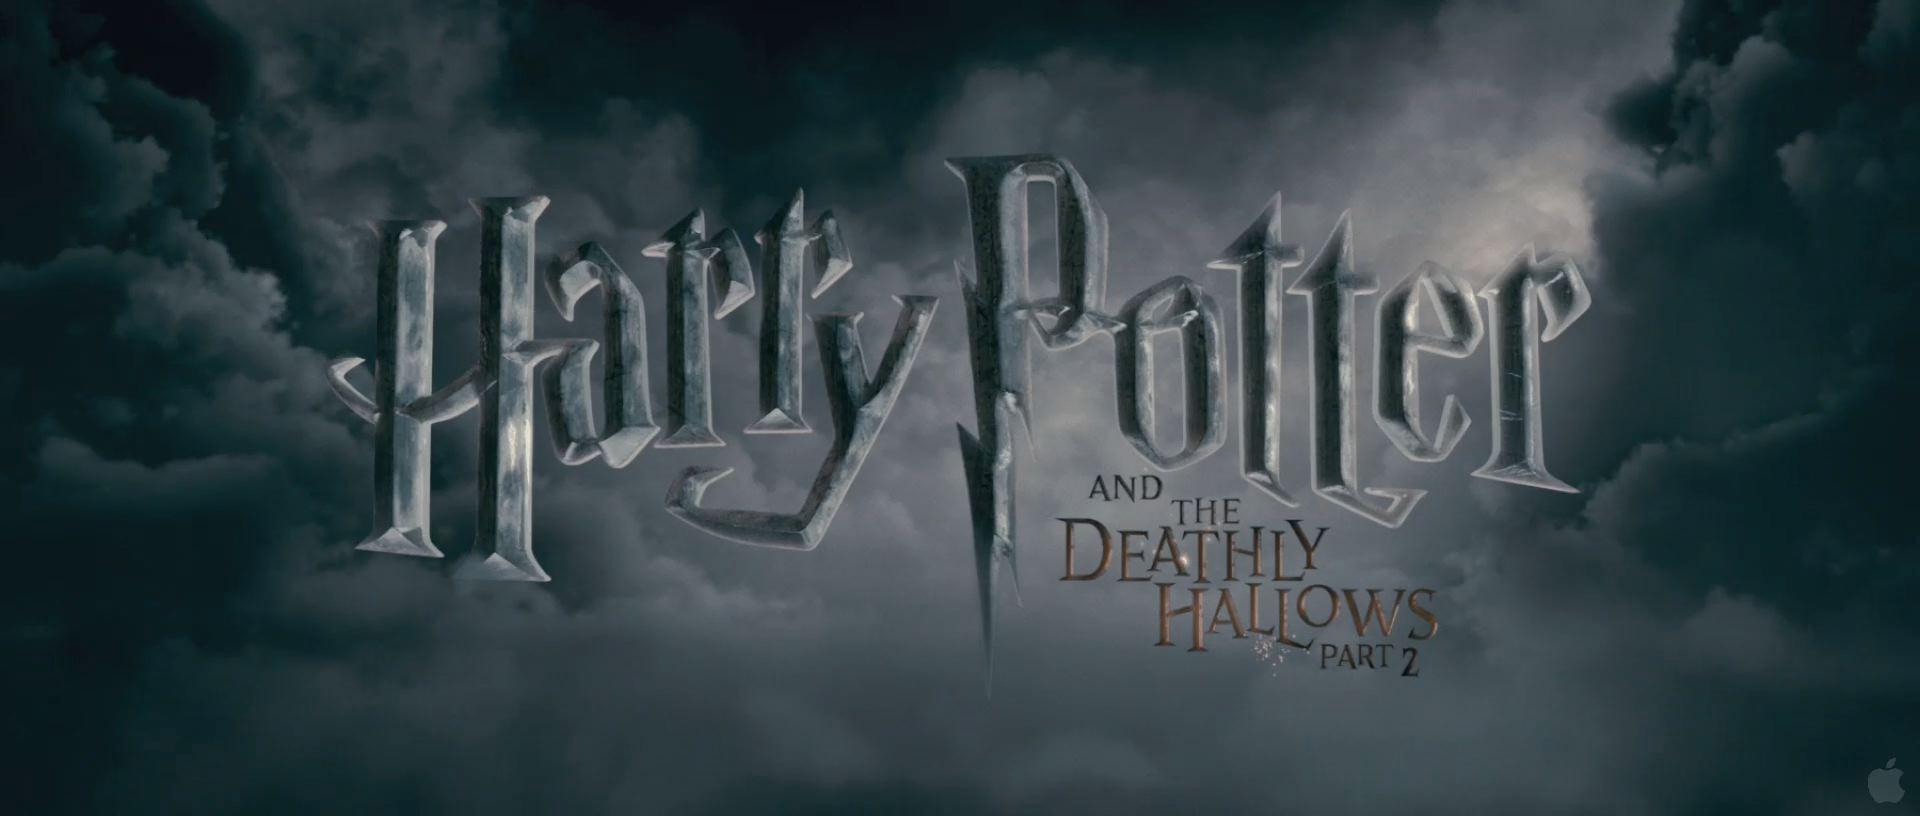 Harry Potter BlogHogwarts HP7 2 Trailer 93